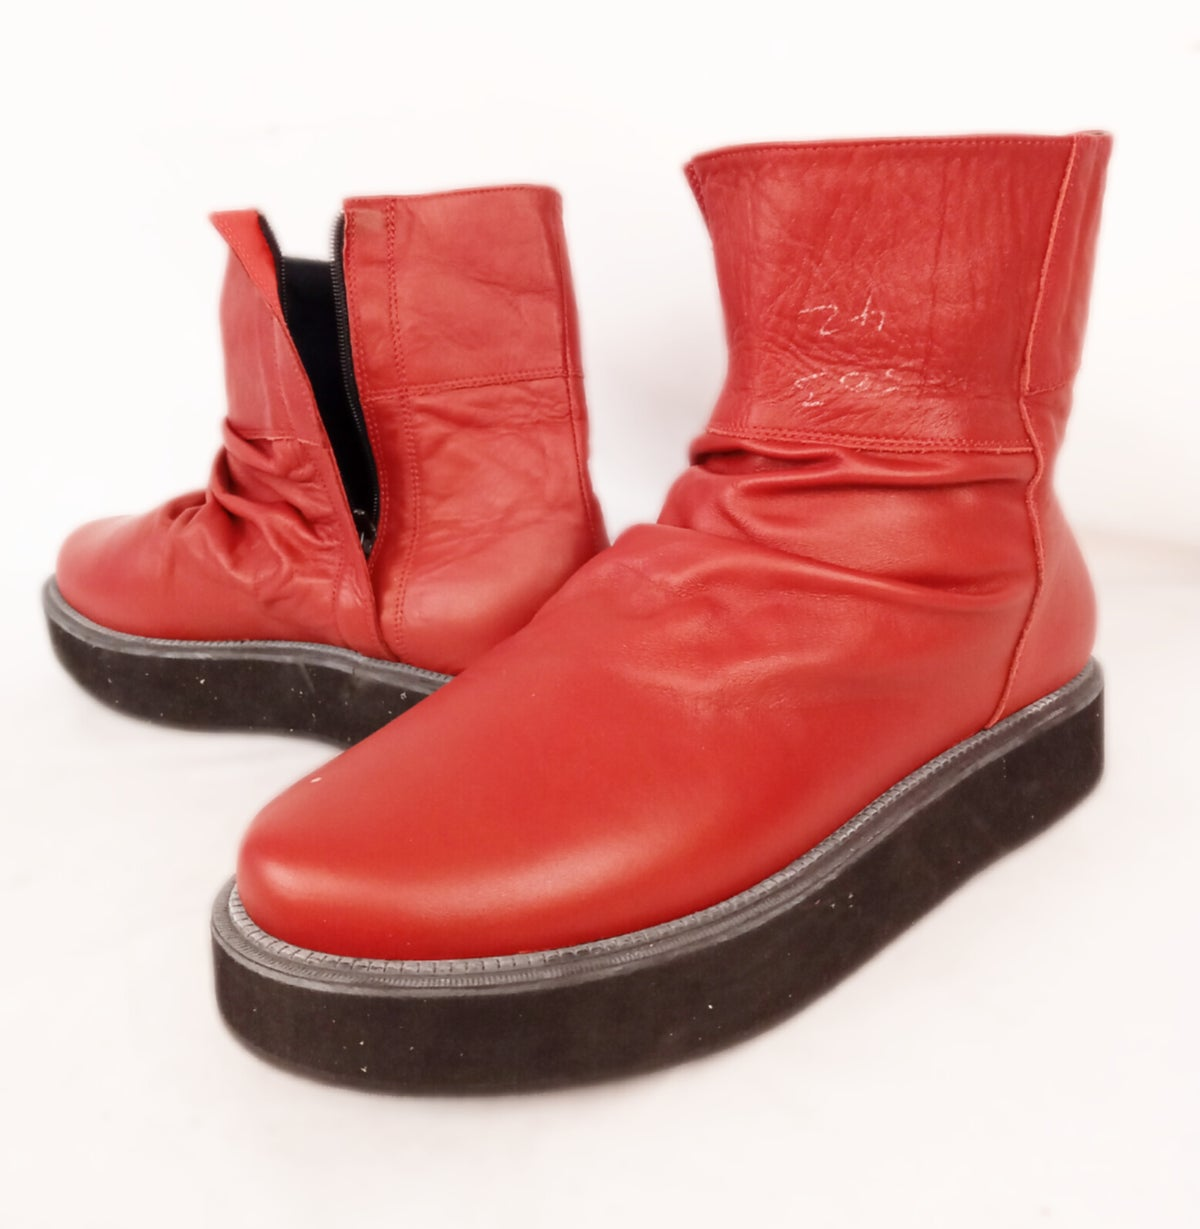 Image of #18 - B Grade from Stock - Shoe Size EU 42